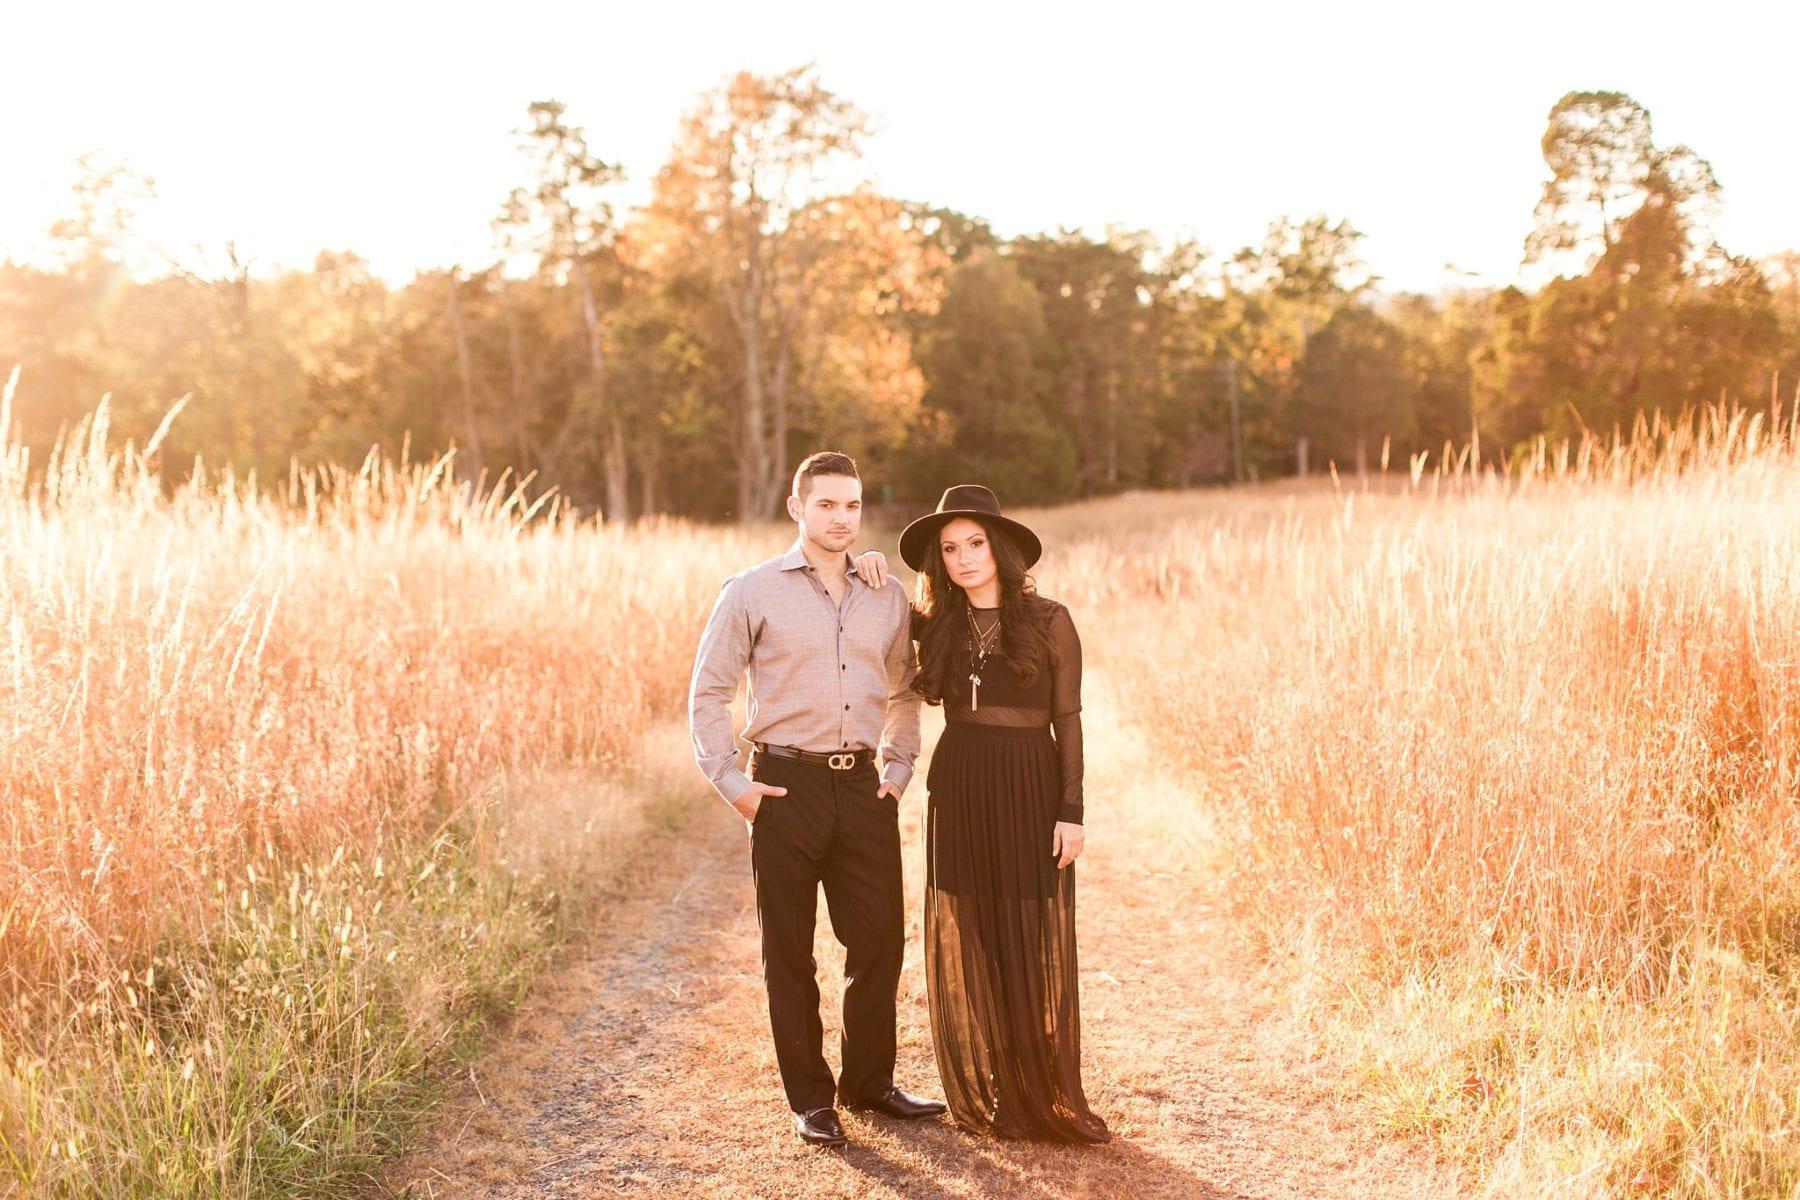 Manassas Battlefield Portraits Virginia Wedding Photographer Megan Kelsey Photography Lianne & Chris-164.jpg